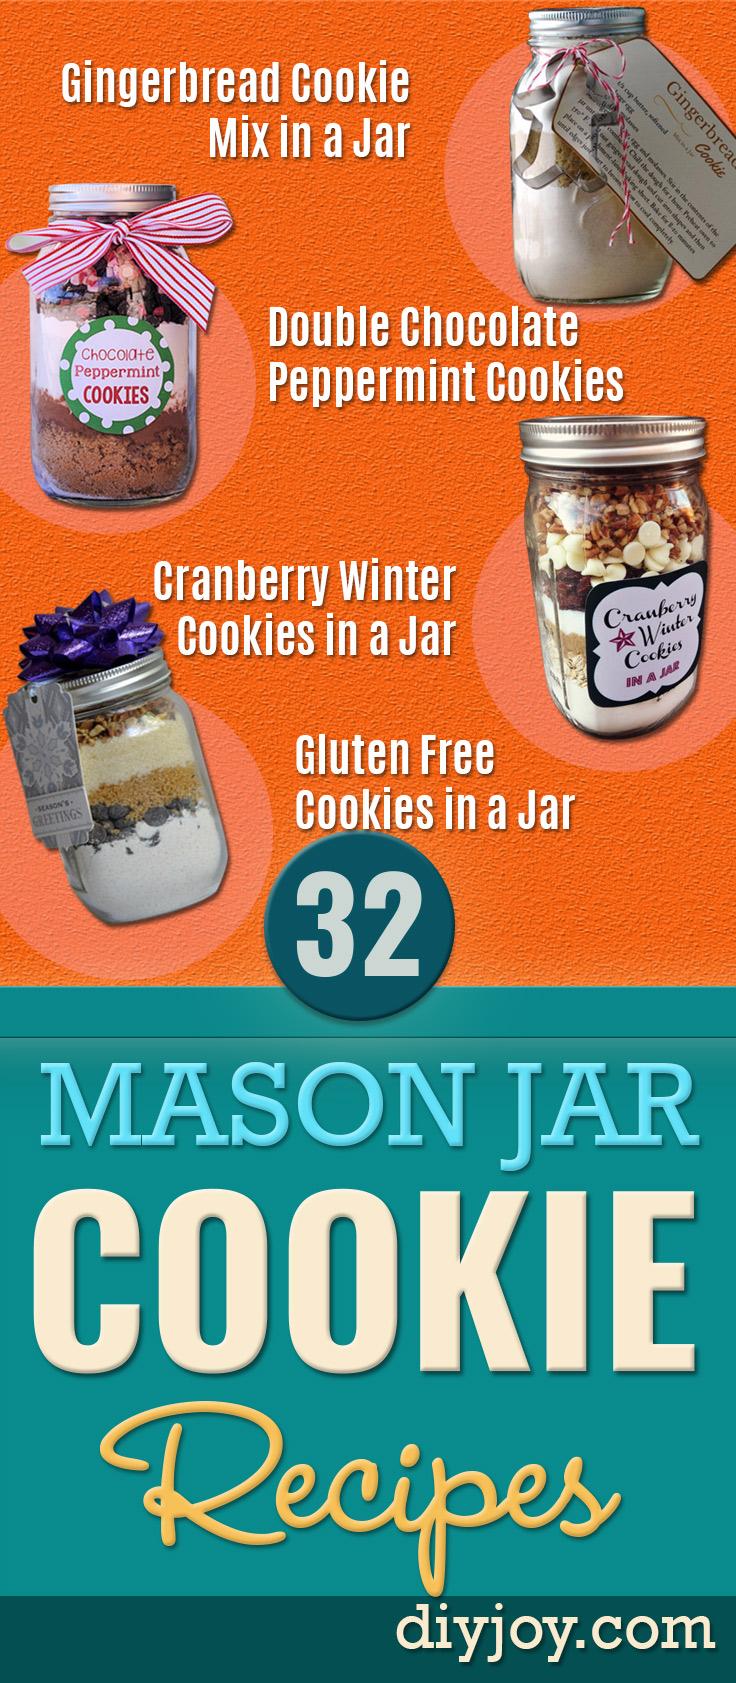 Mason Jar Cookie Recipe Pinterest